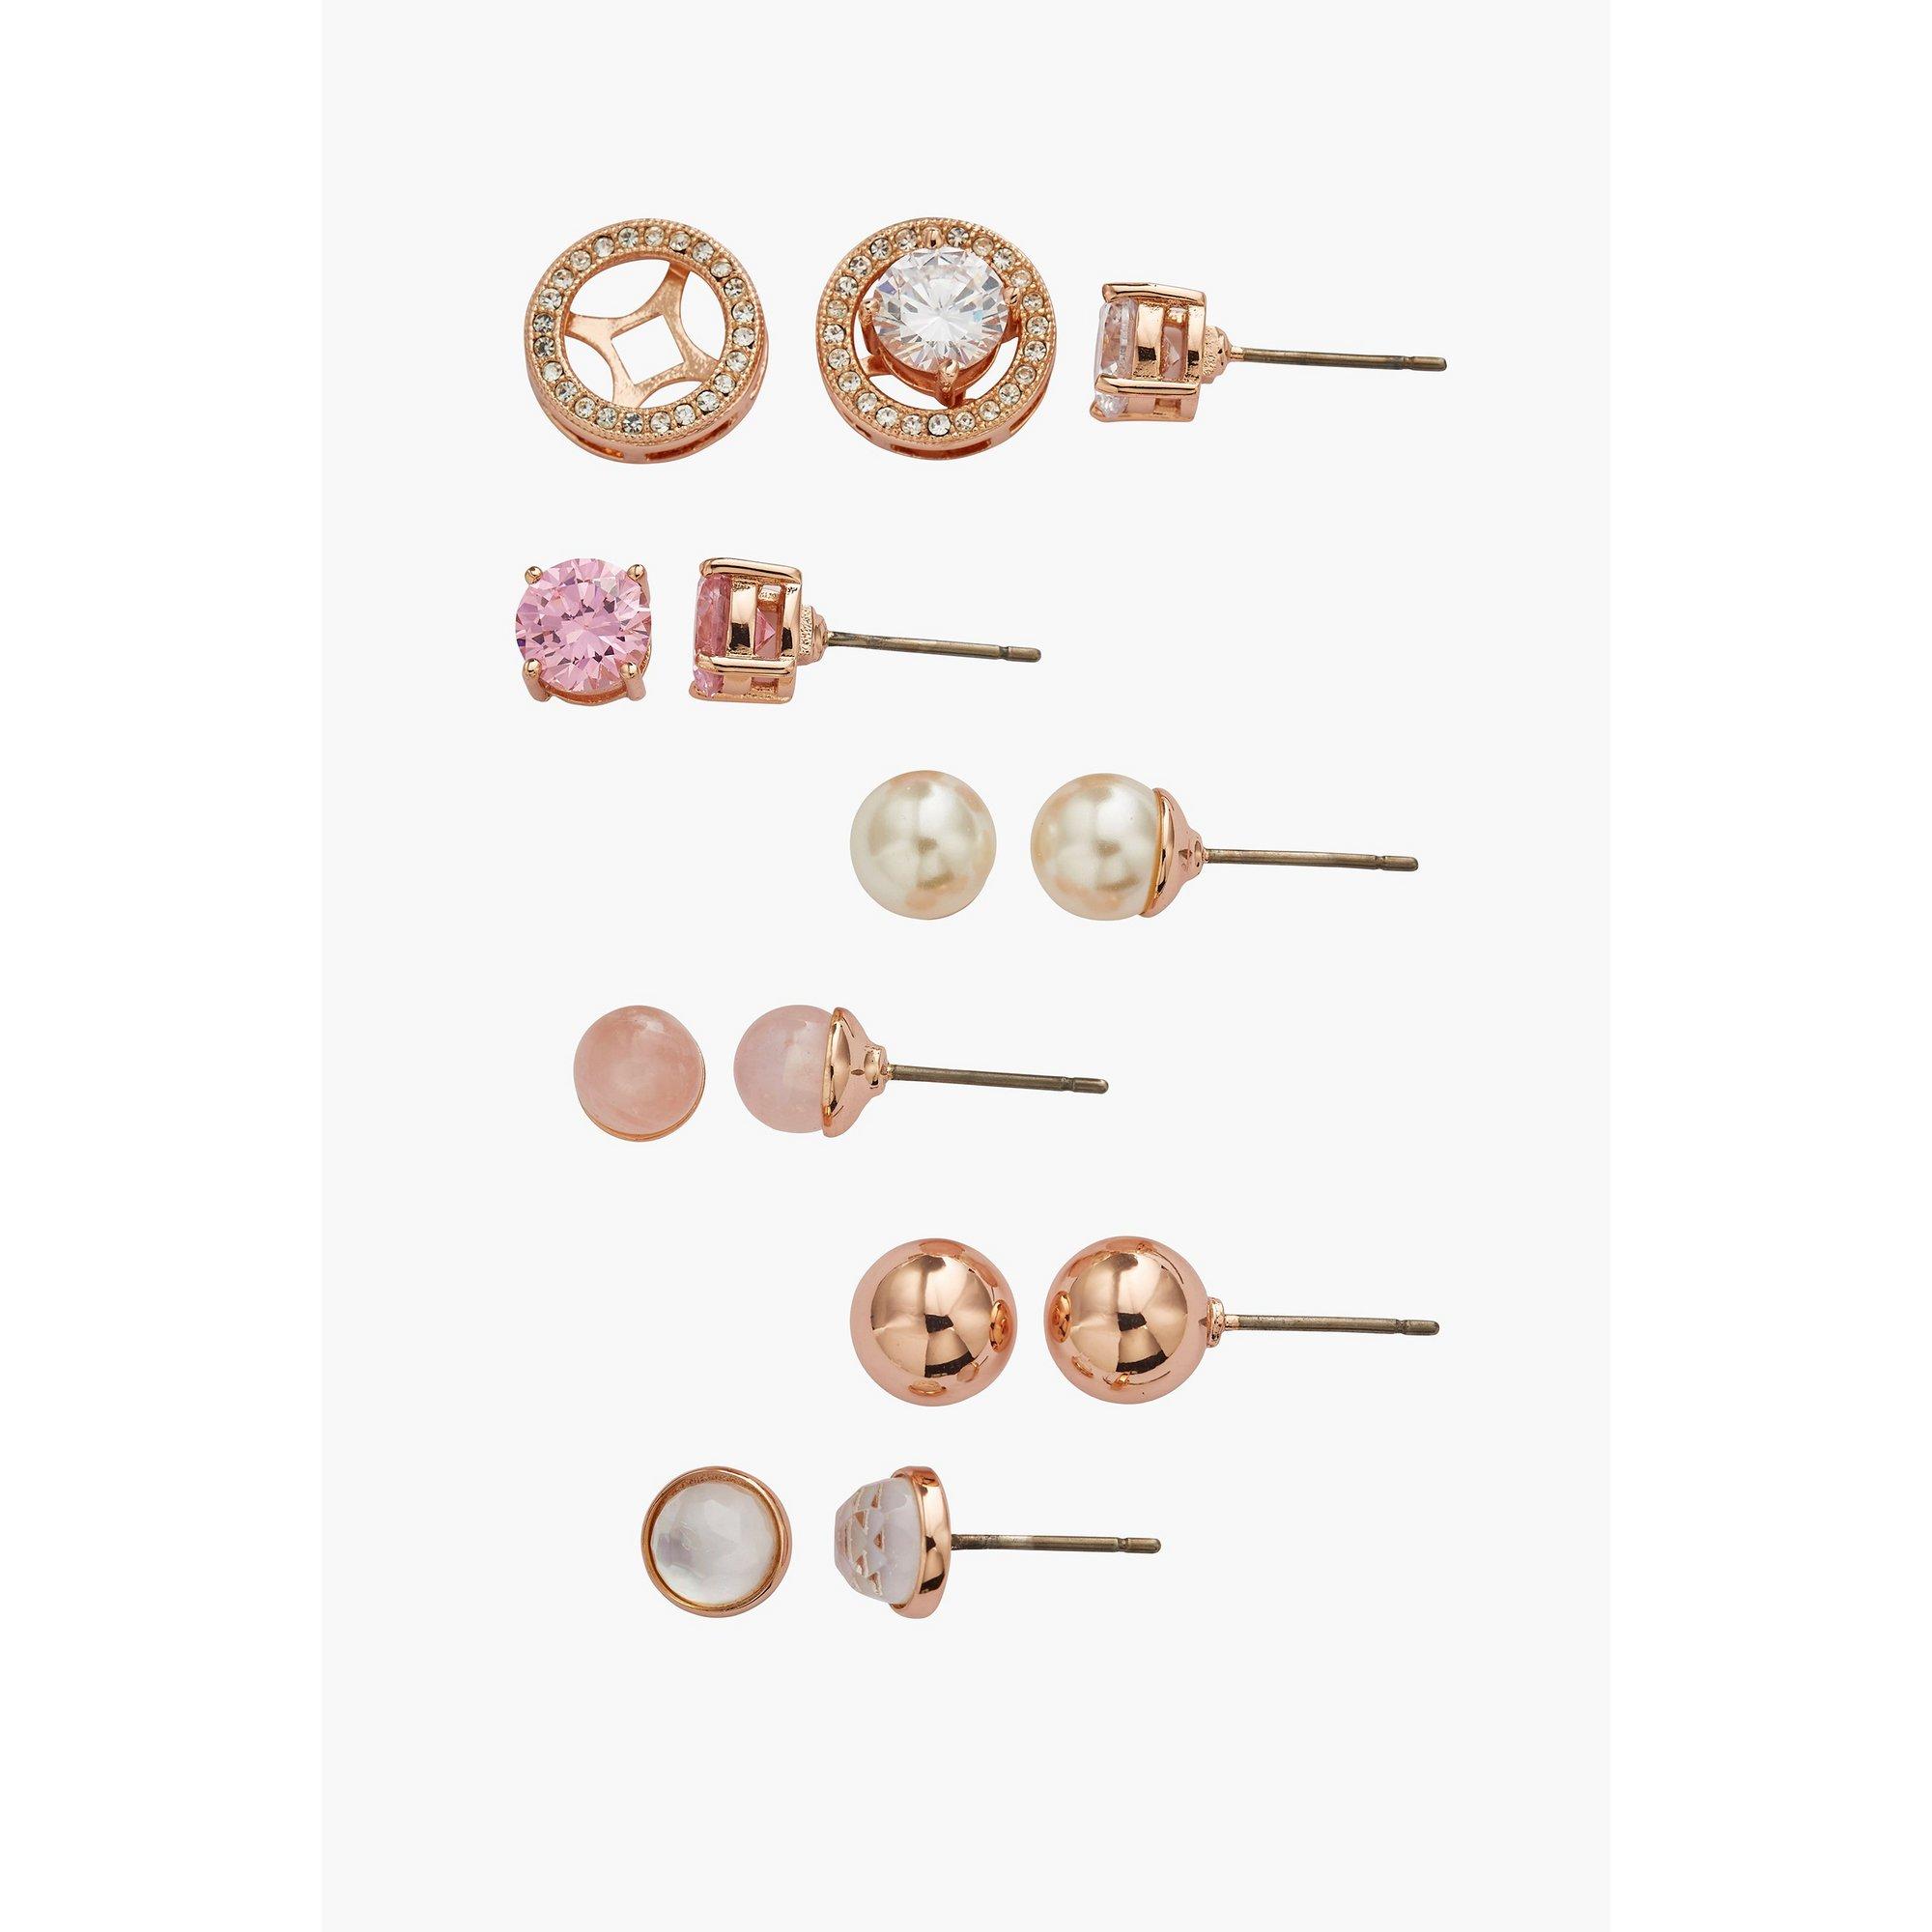 Image of Buckley London Rose Gold Interchangeable Earring Set